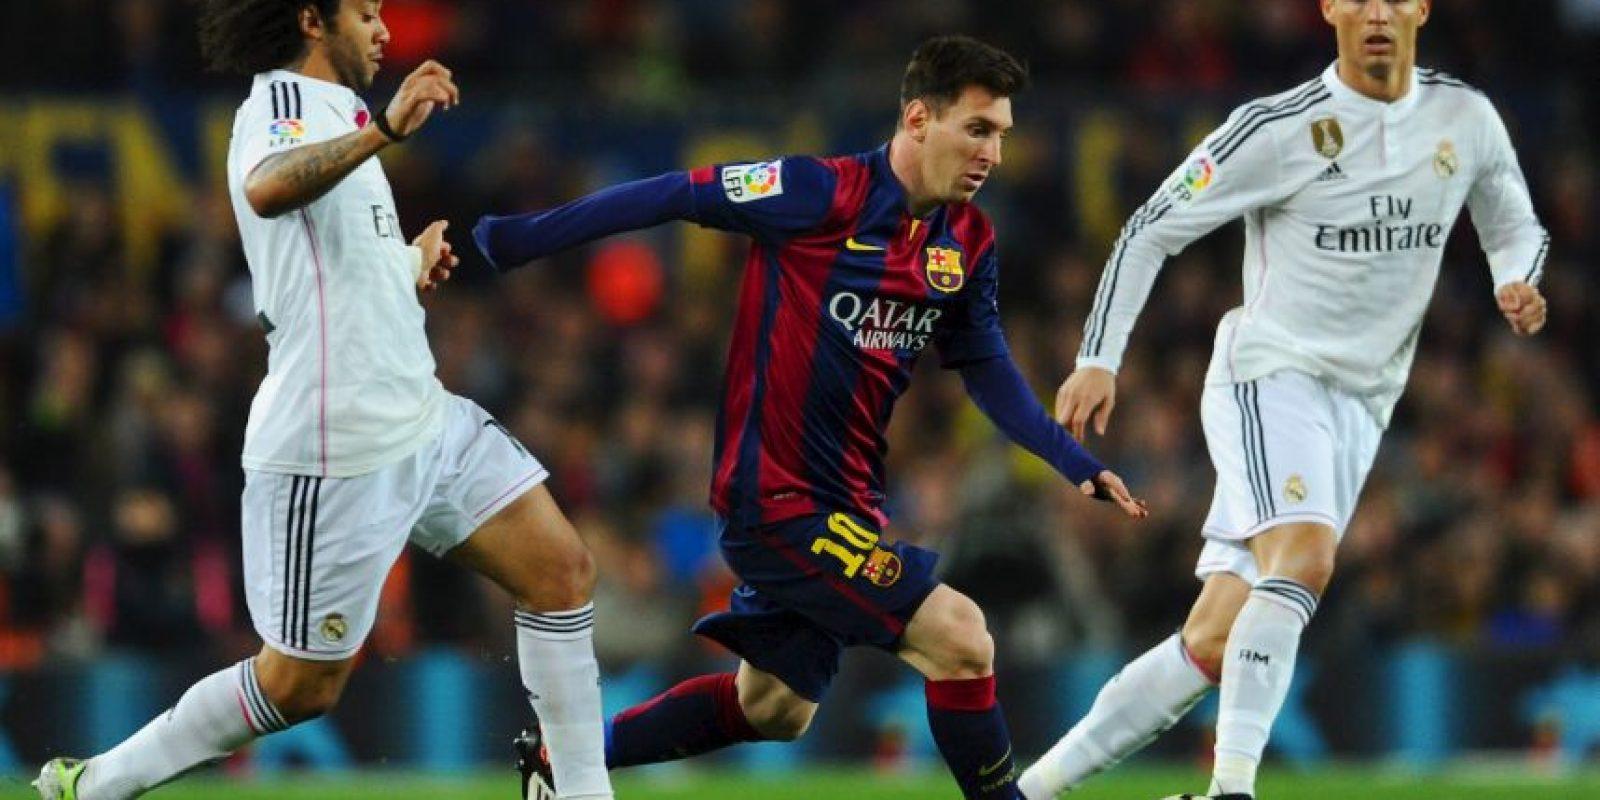 Messi da una asistencia cada 279 minutos Foto:Getty Images